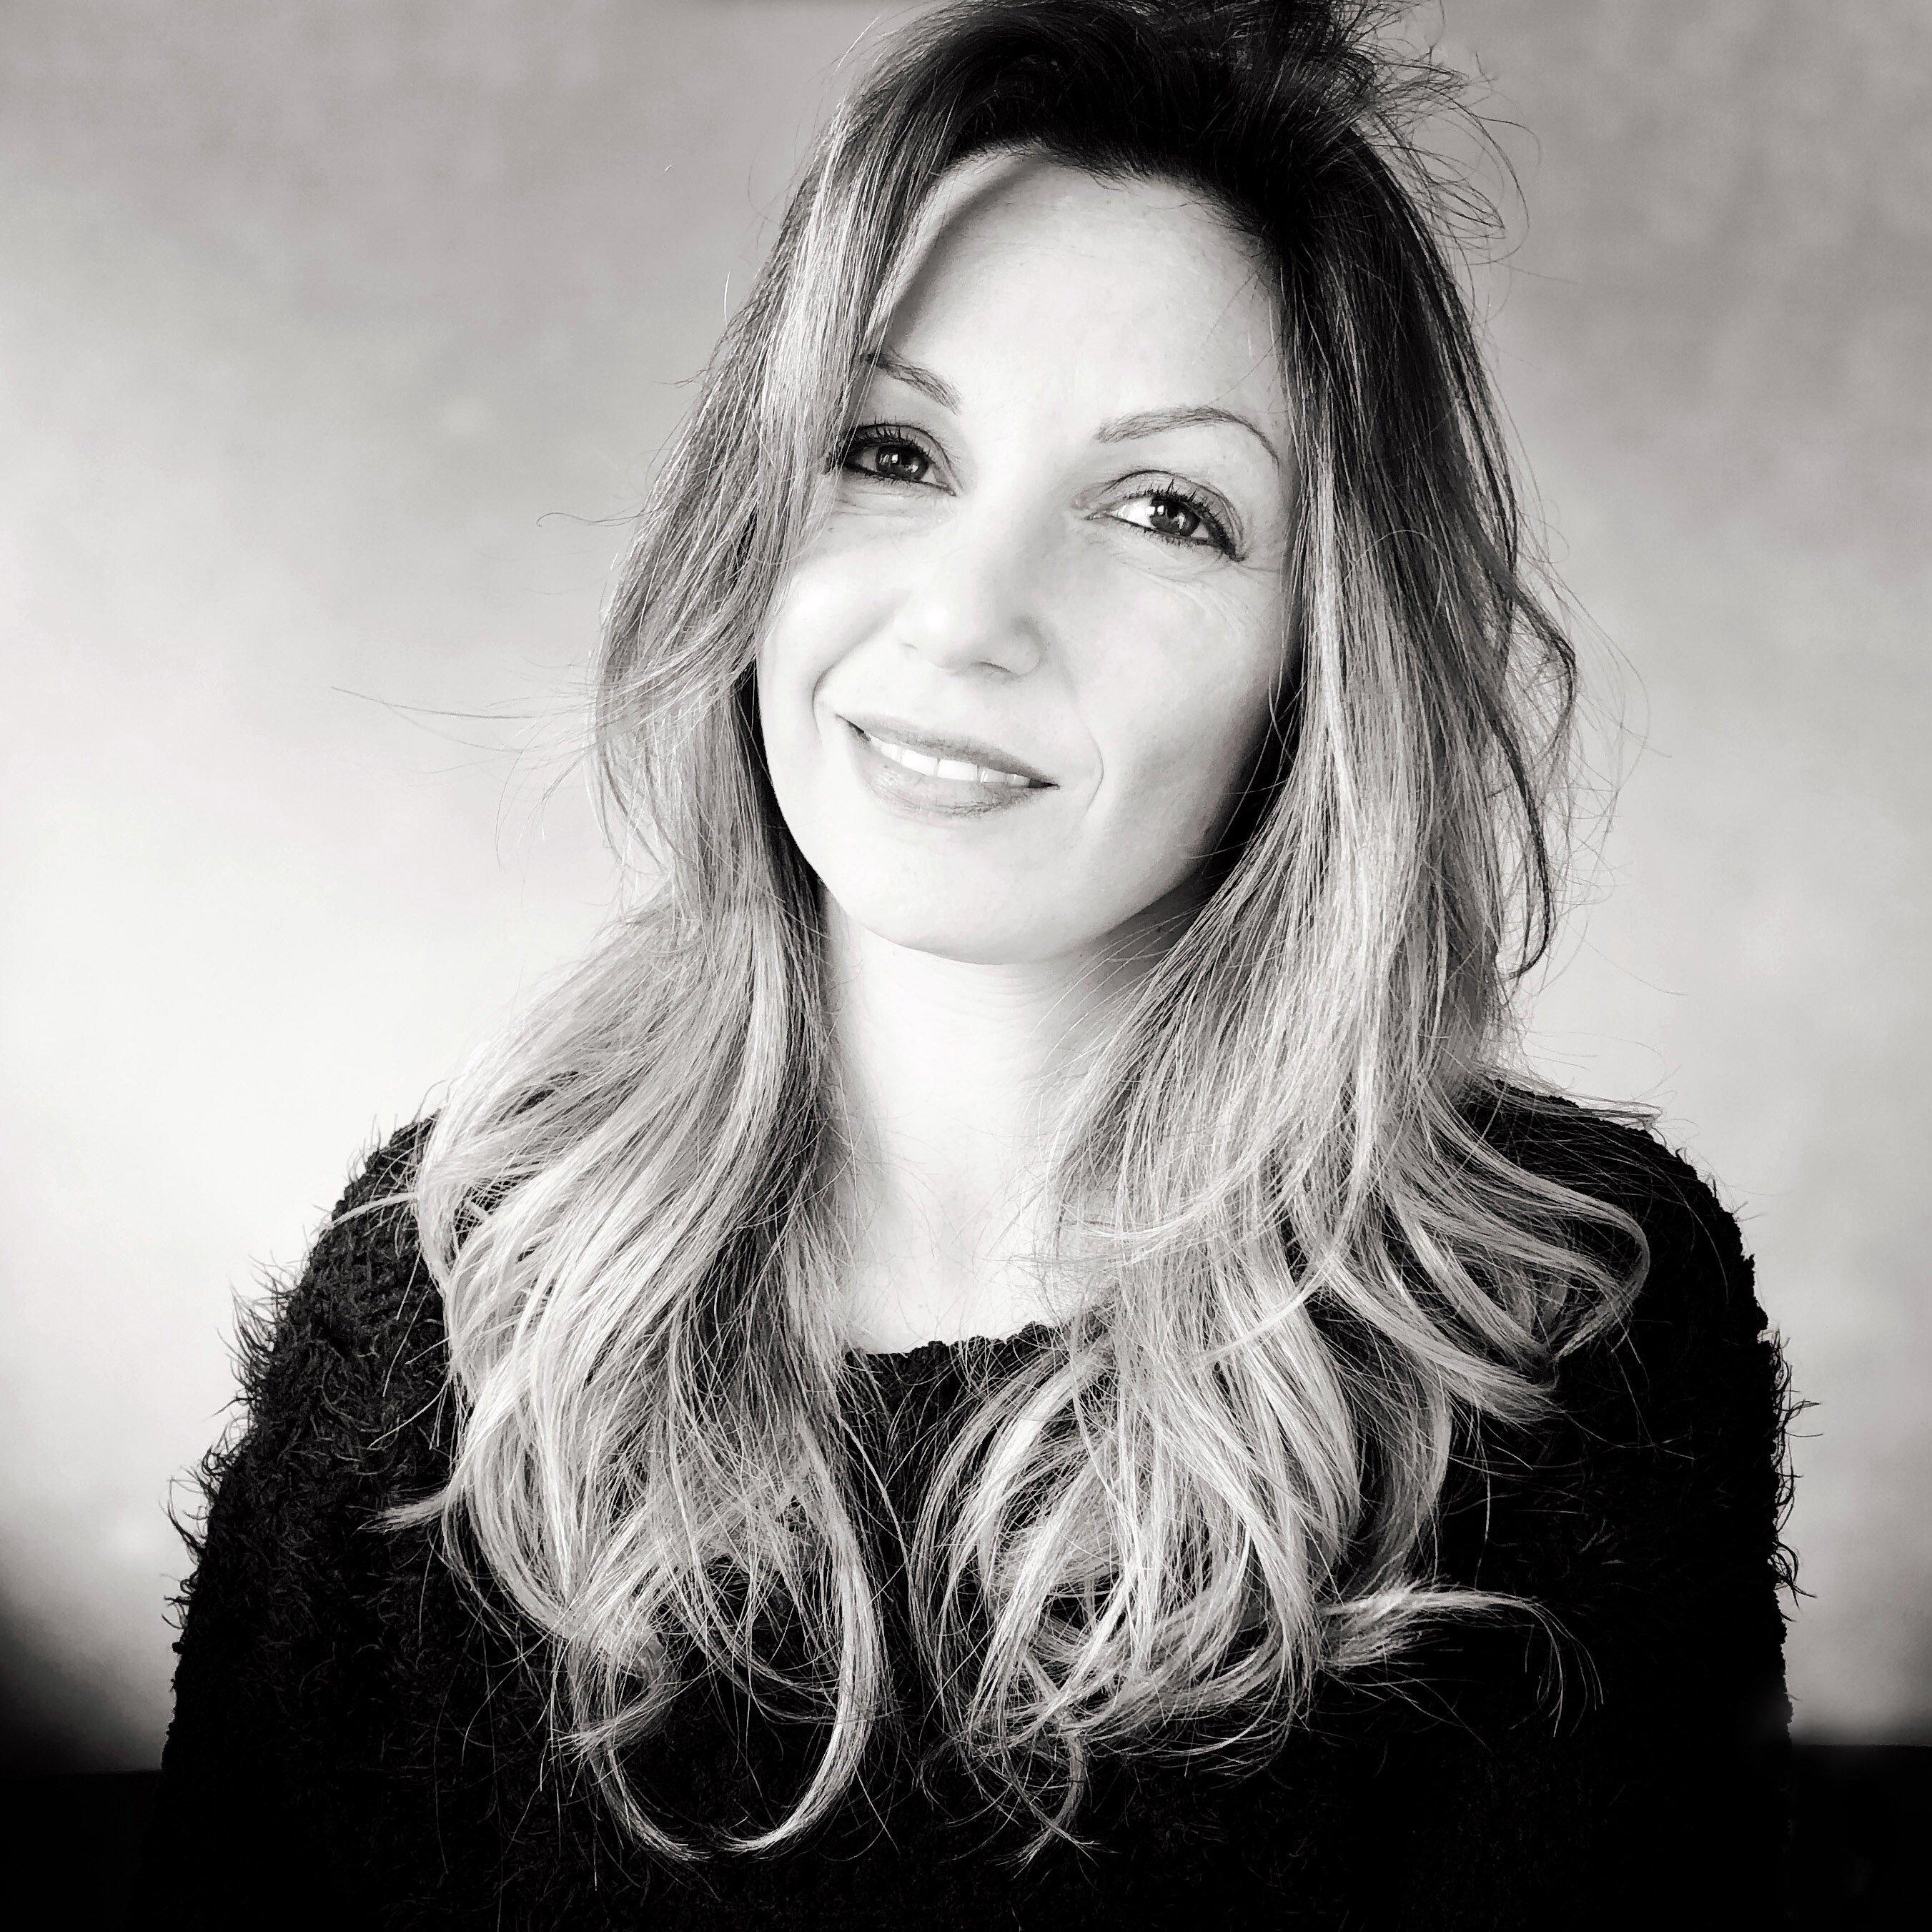 Natascia Aquilano